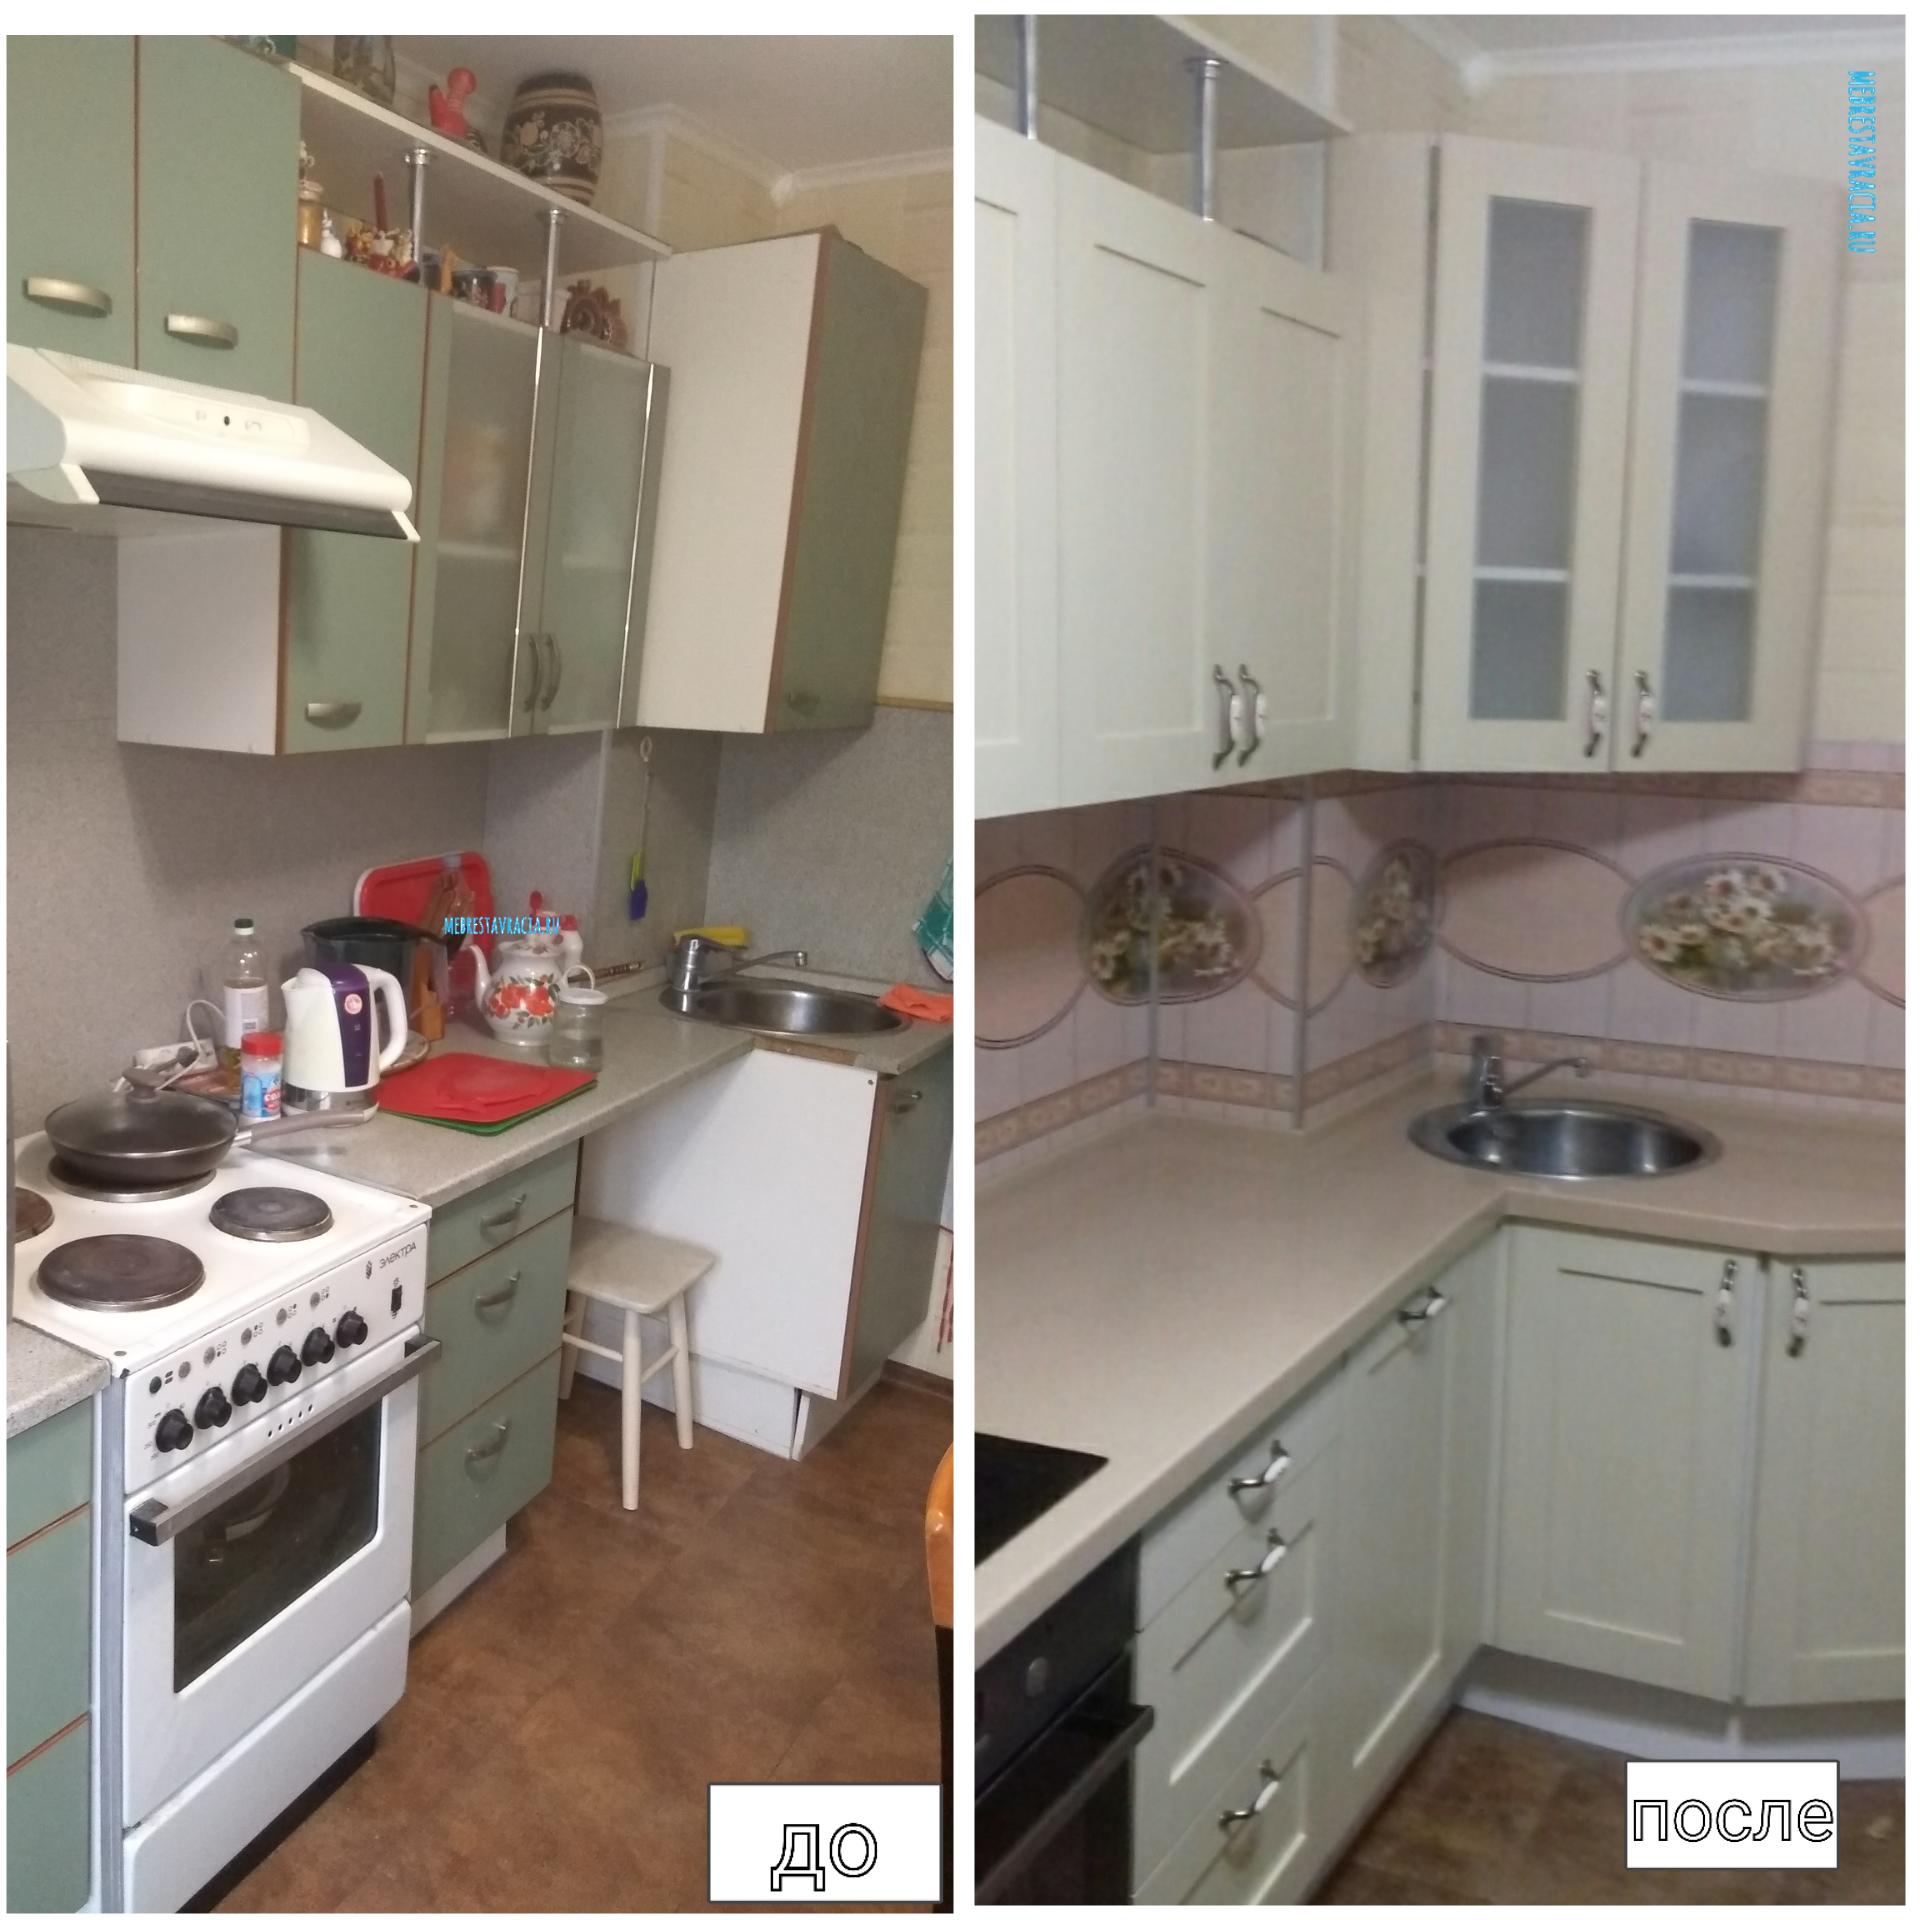 Реставрация фасадов кухни своими руками 21